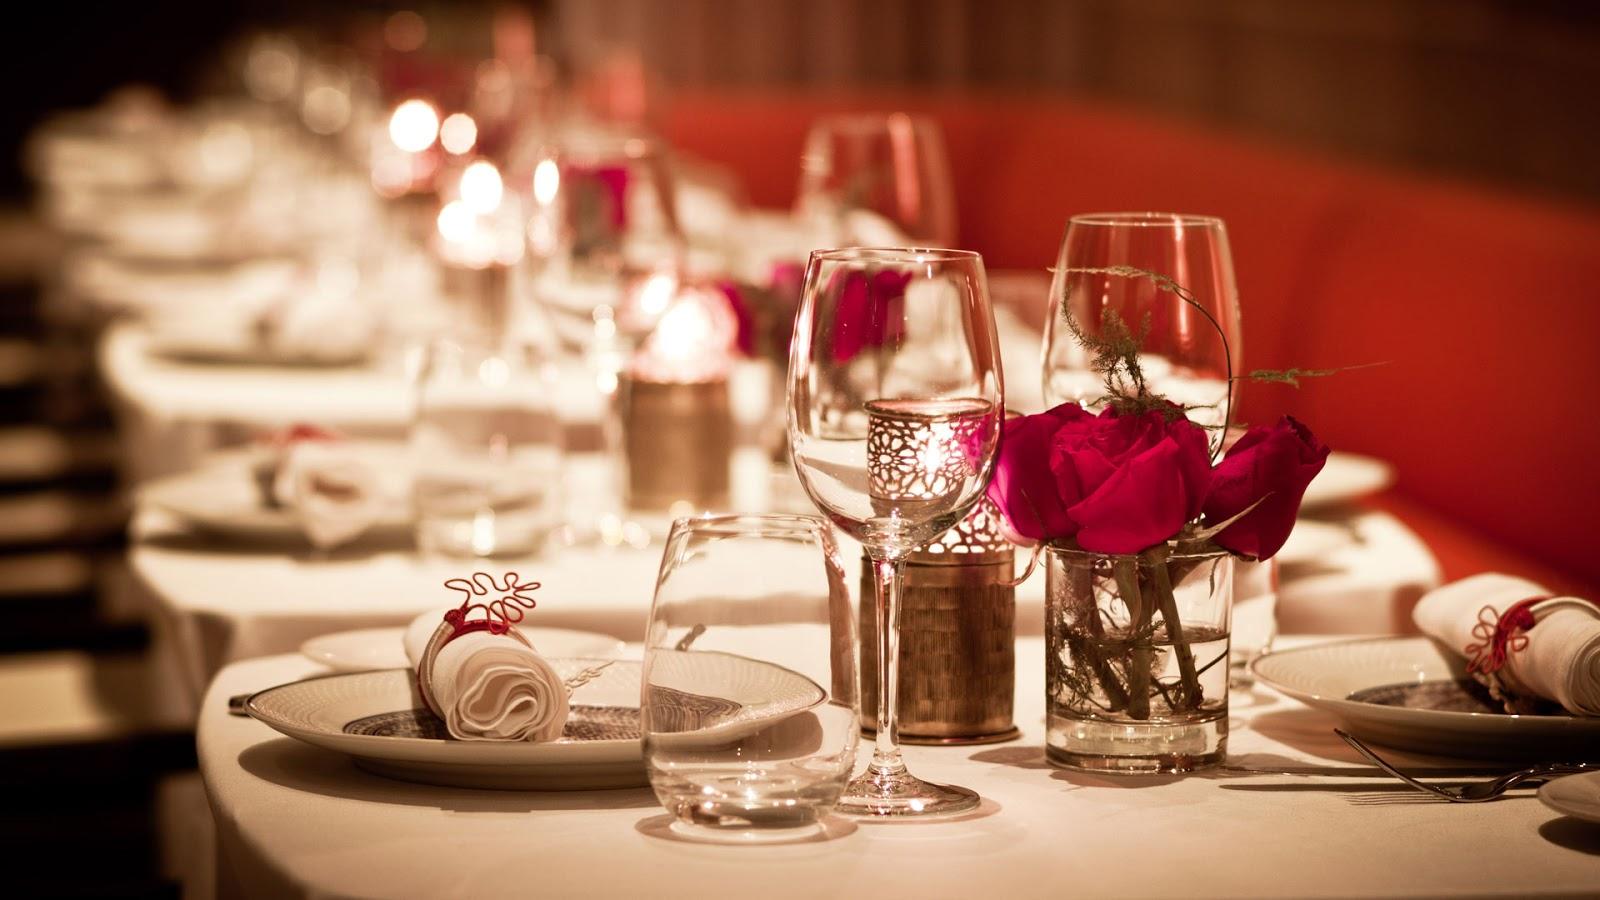 Restaurant Gastronomique Champagne Qualit Ef Bf Bd